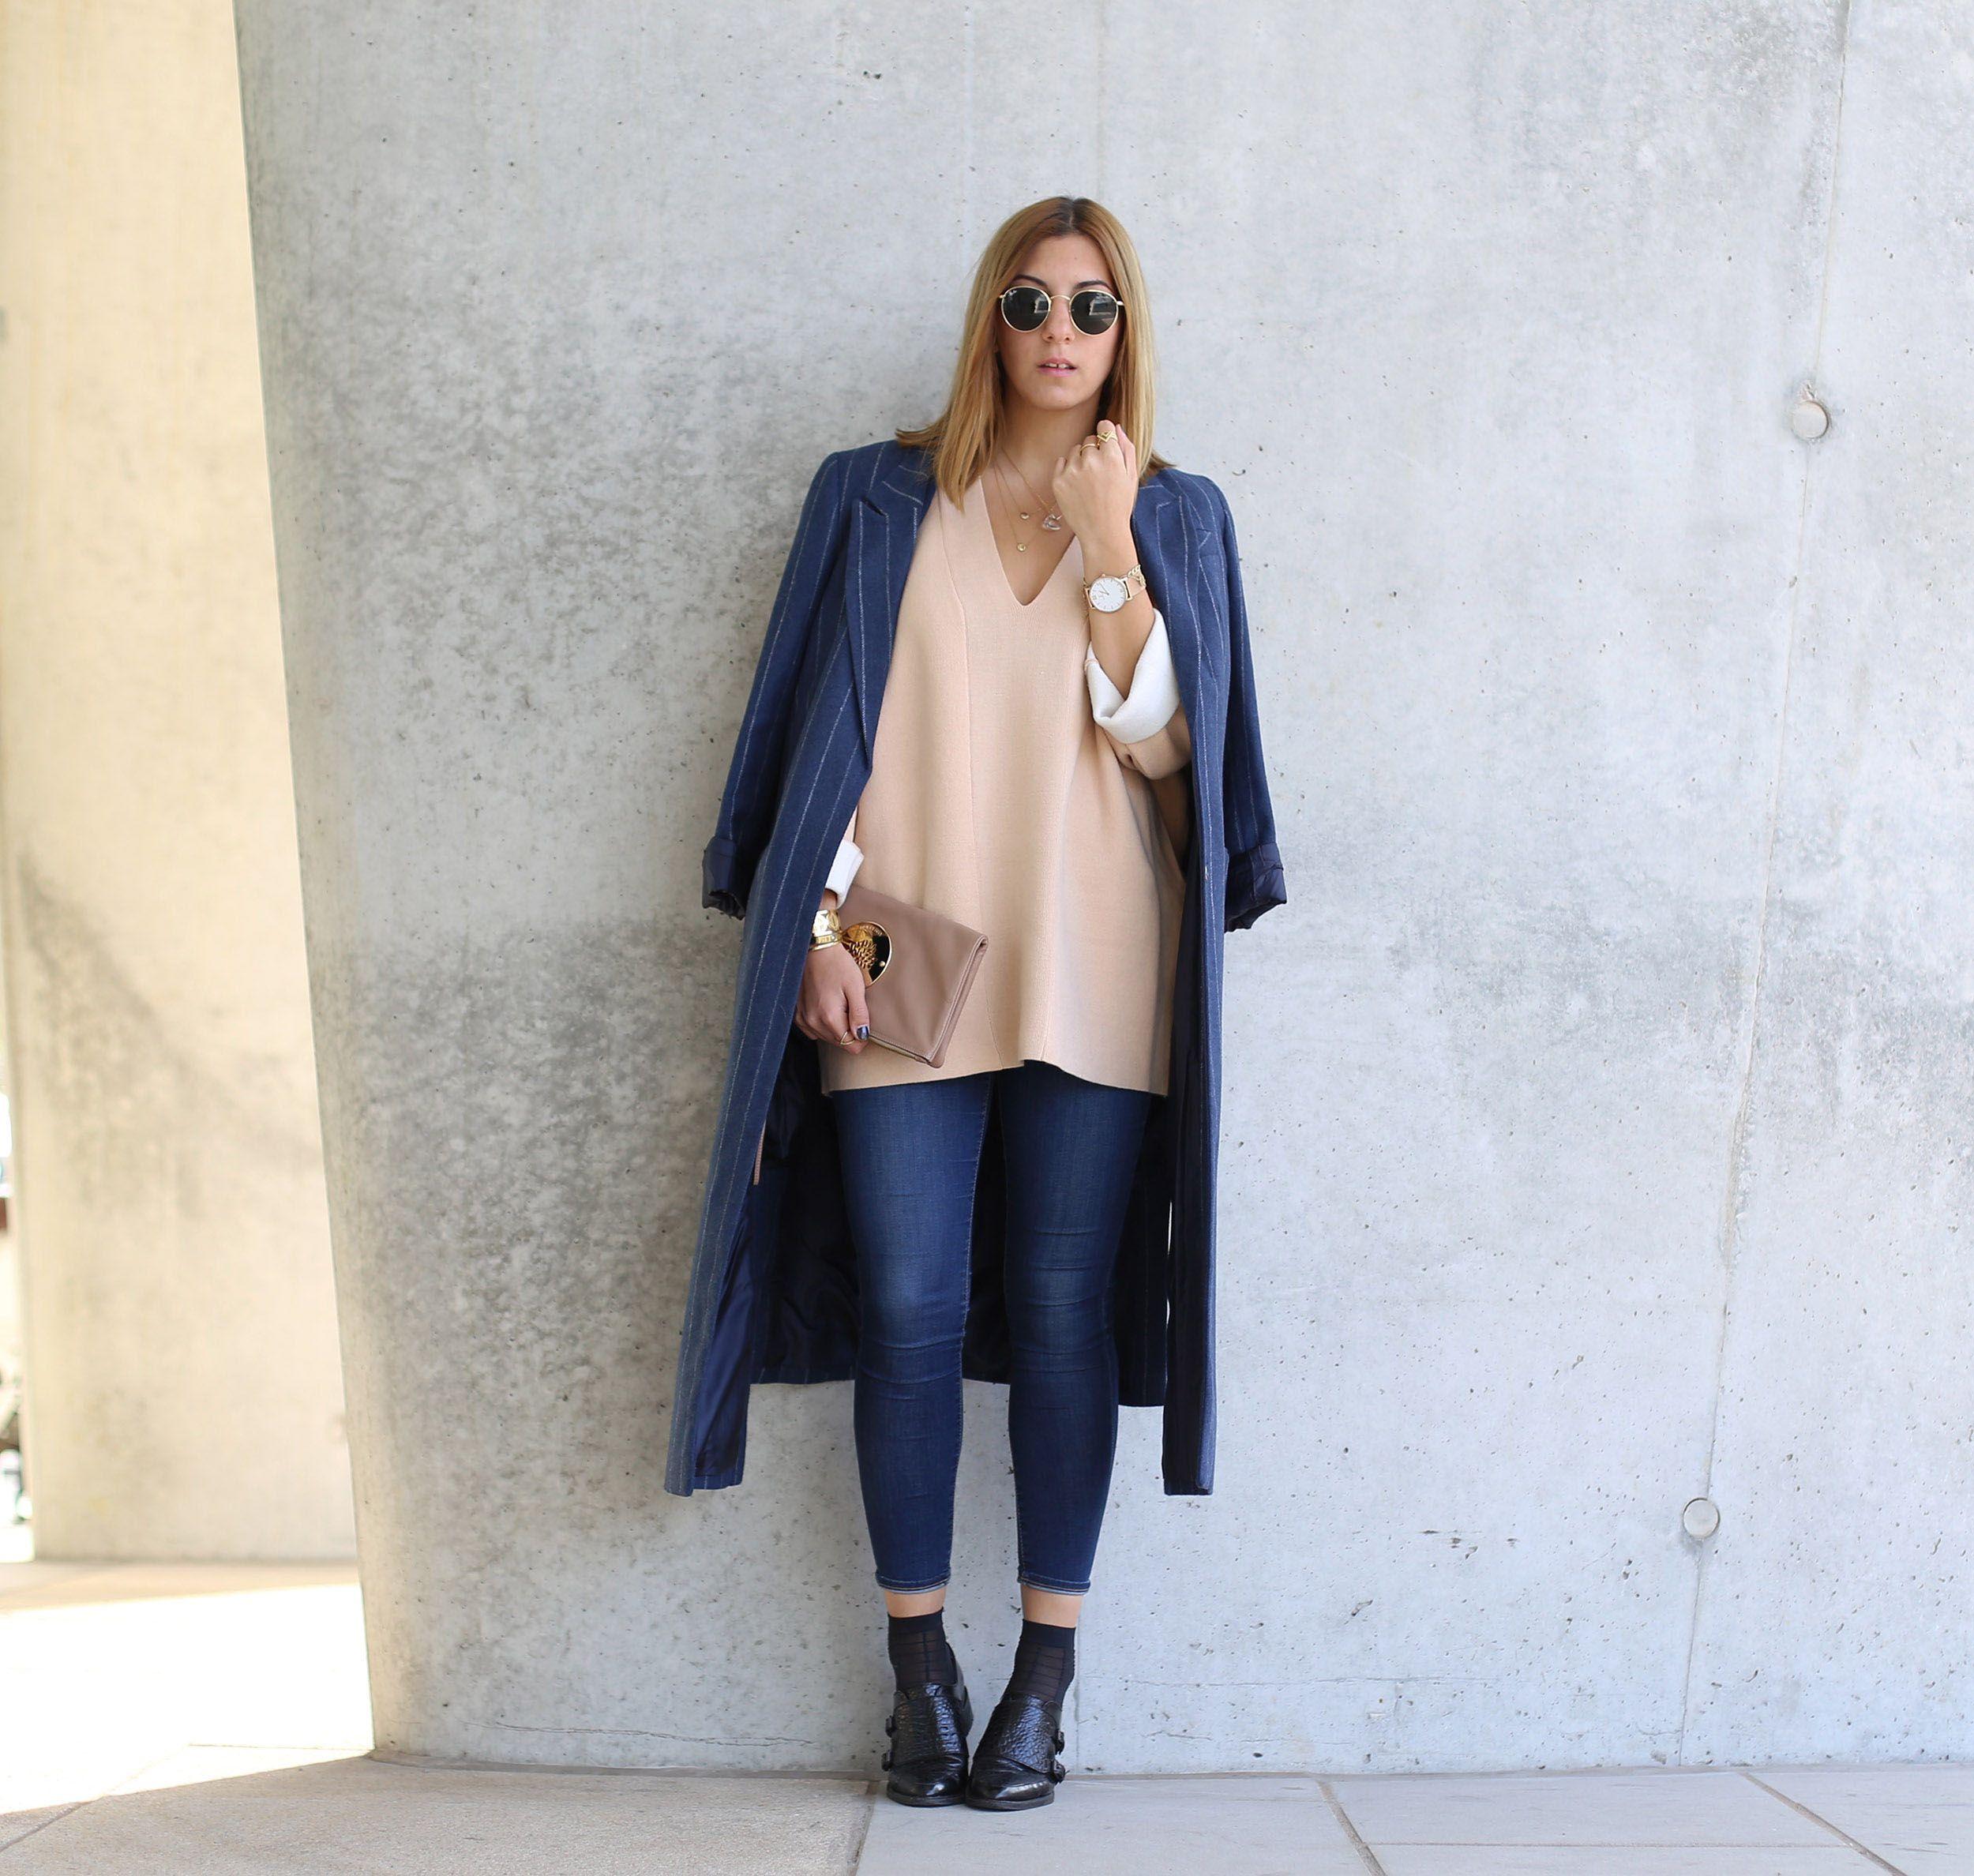 streetstyle-blogger1